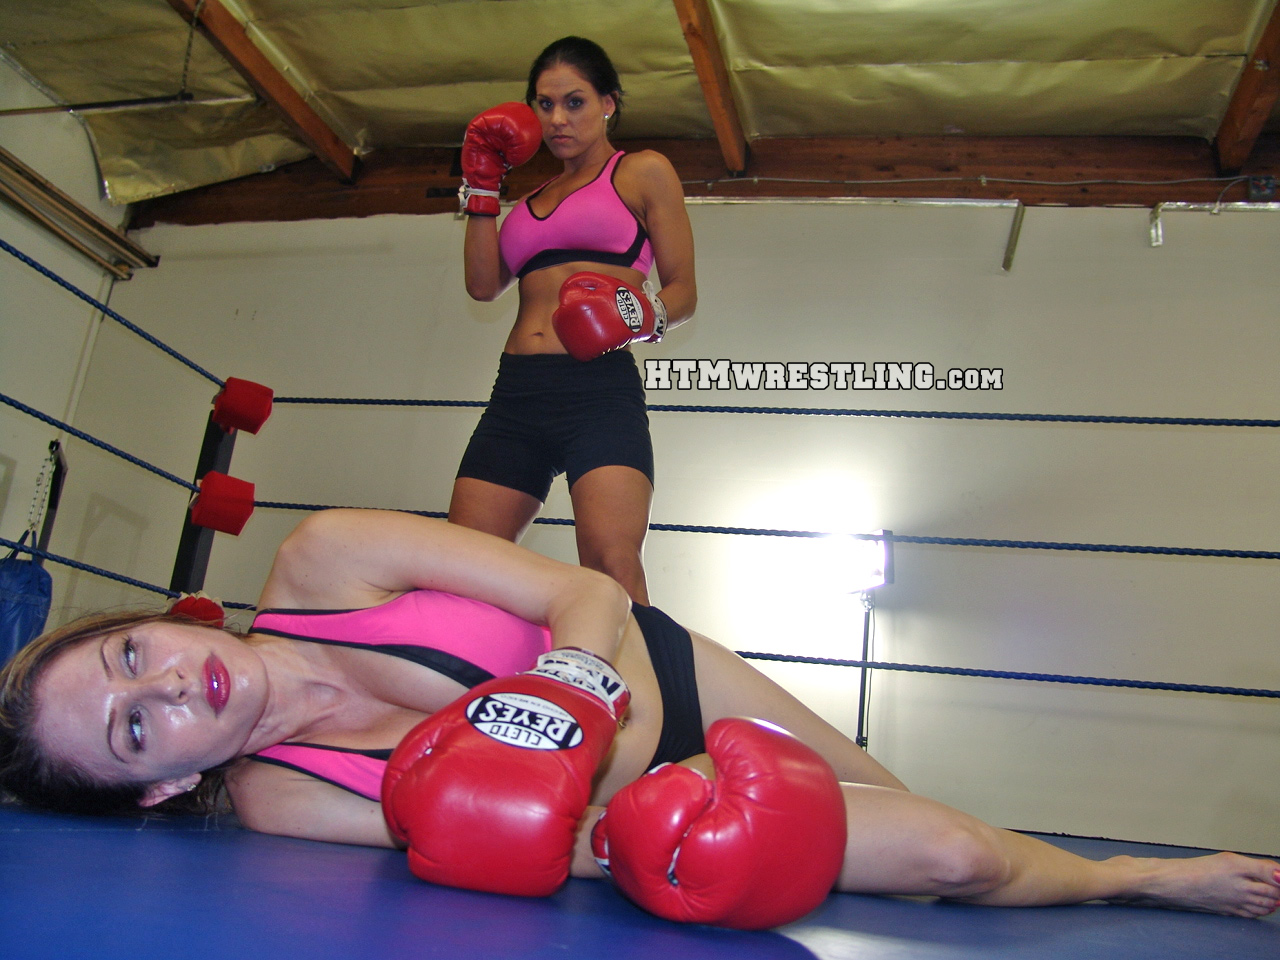 Mature Women Boxing Hot Girl HQ Wallpaper